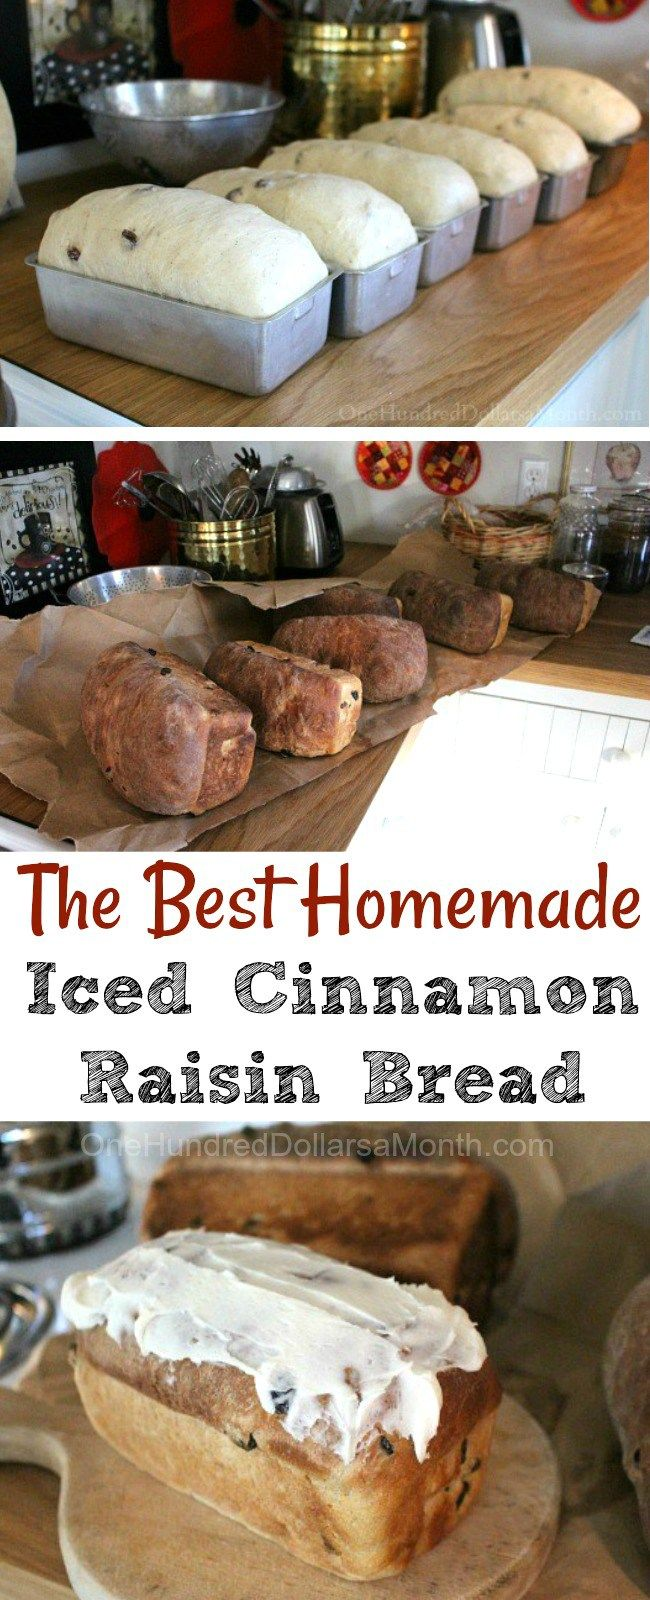 Shirley's Iced Cinnamon Raisin Bread - One Hundred Dollars a Month